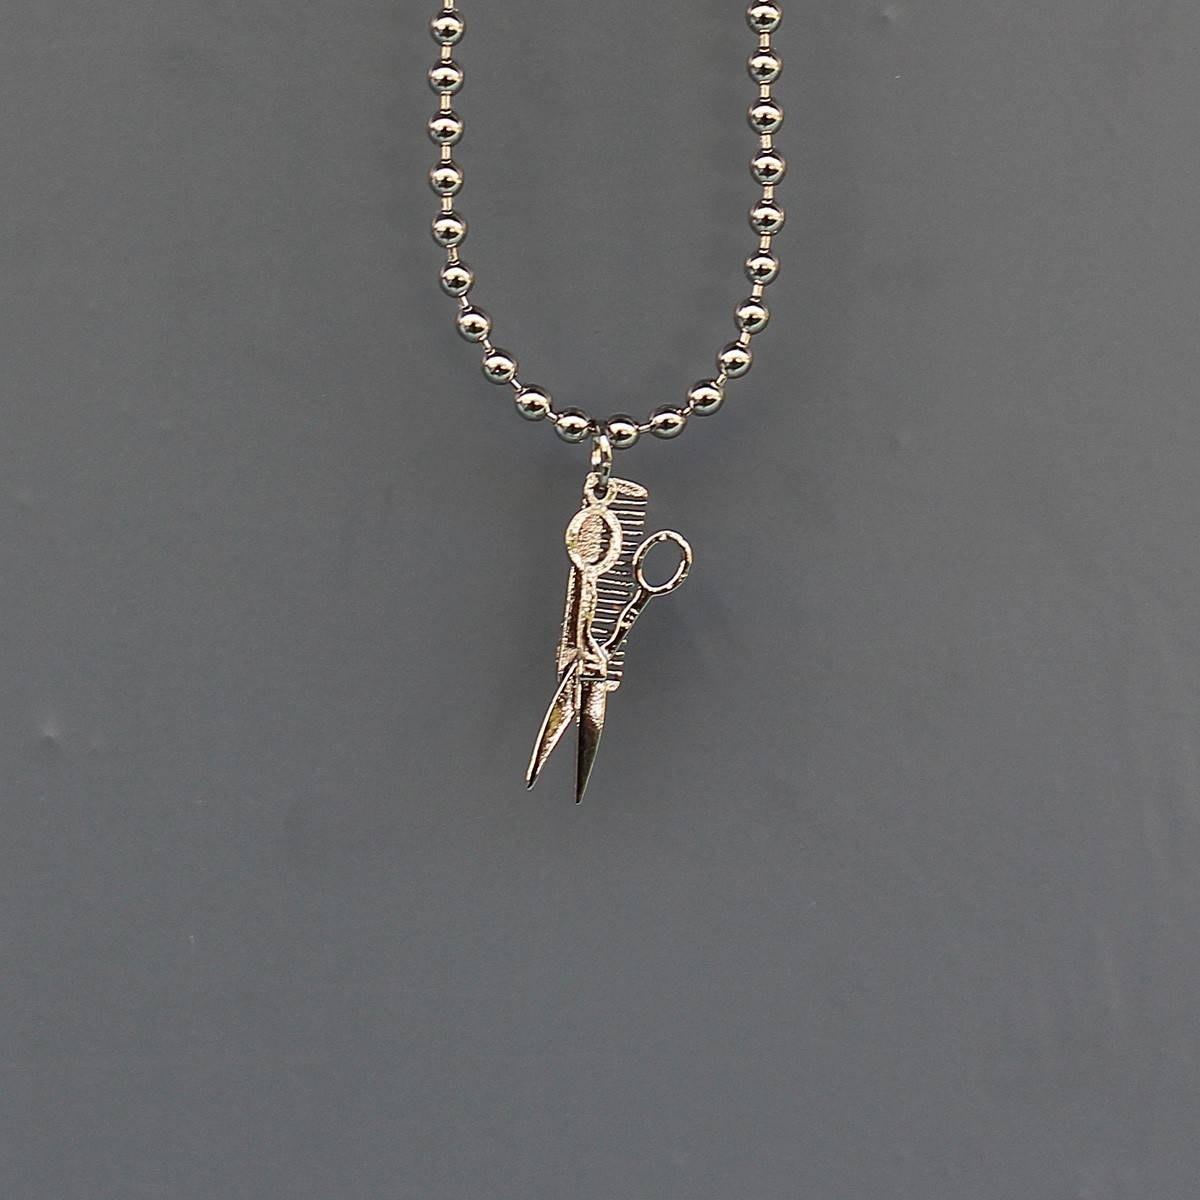 Men's Barber Necklace Silver